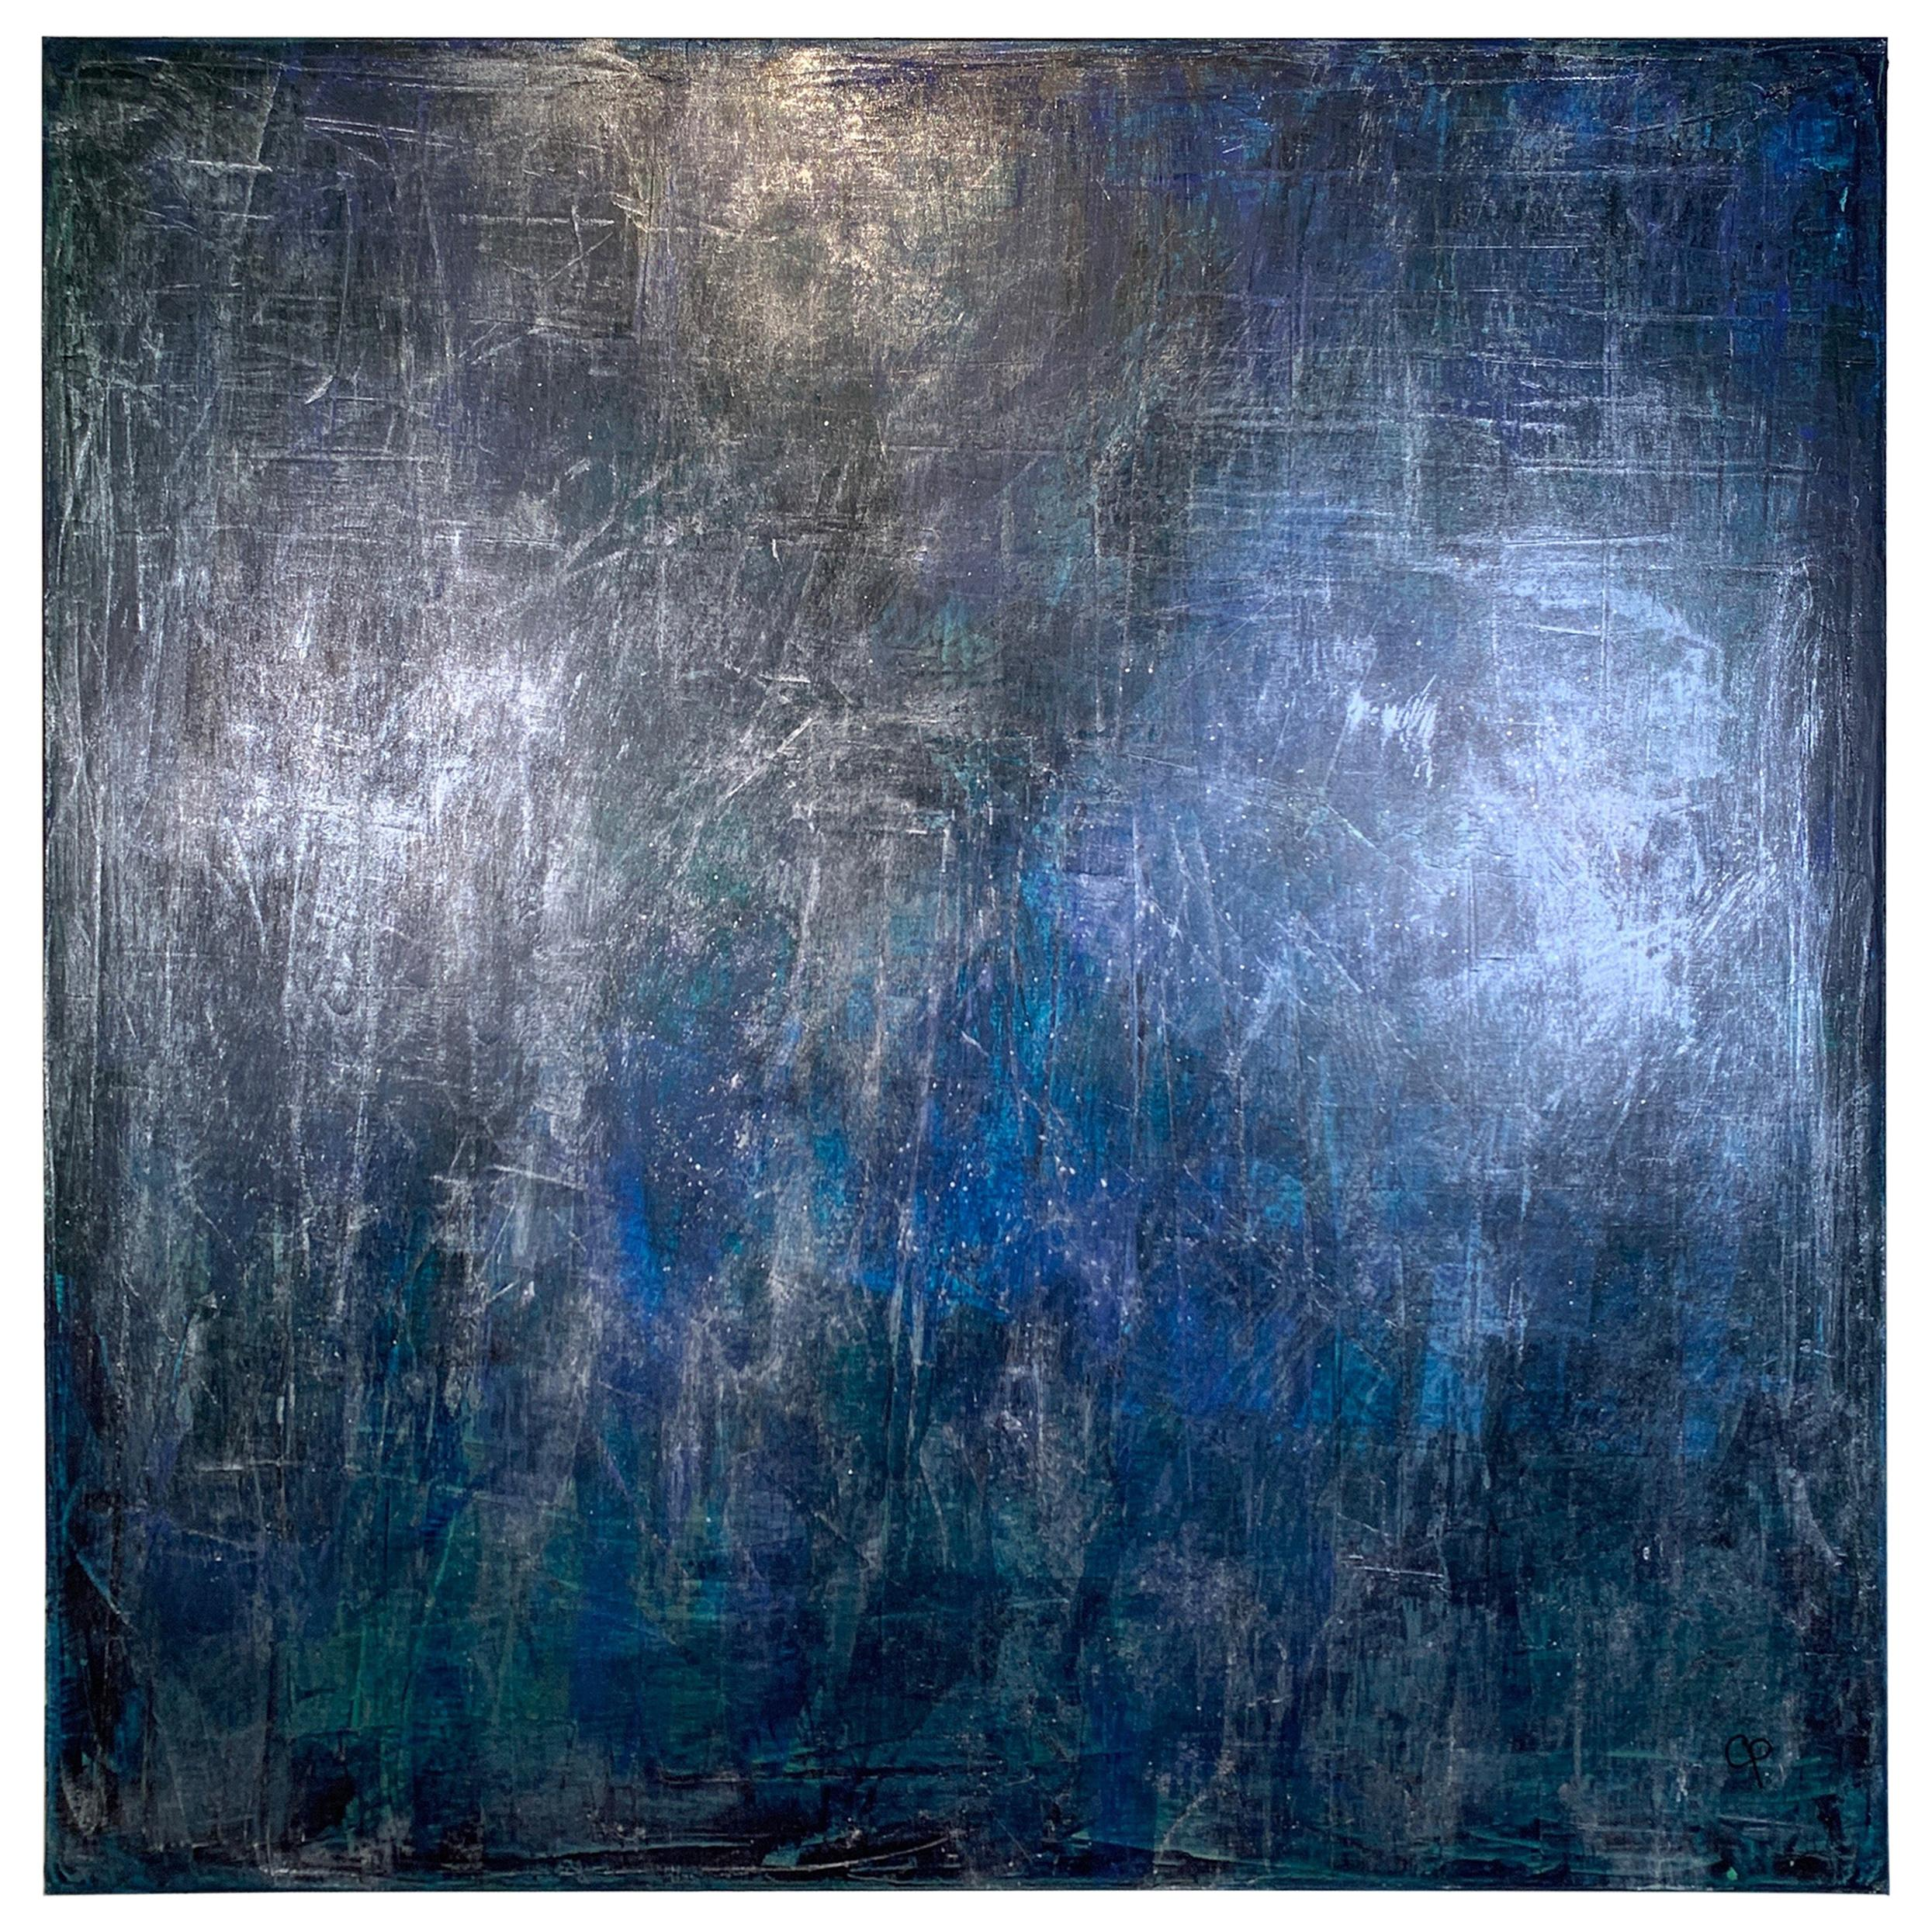 Enchanting Orb, Venetian Plaster and Acrylic Painting, Carol Post, 2019